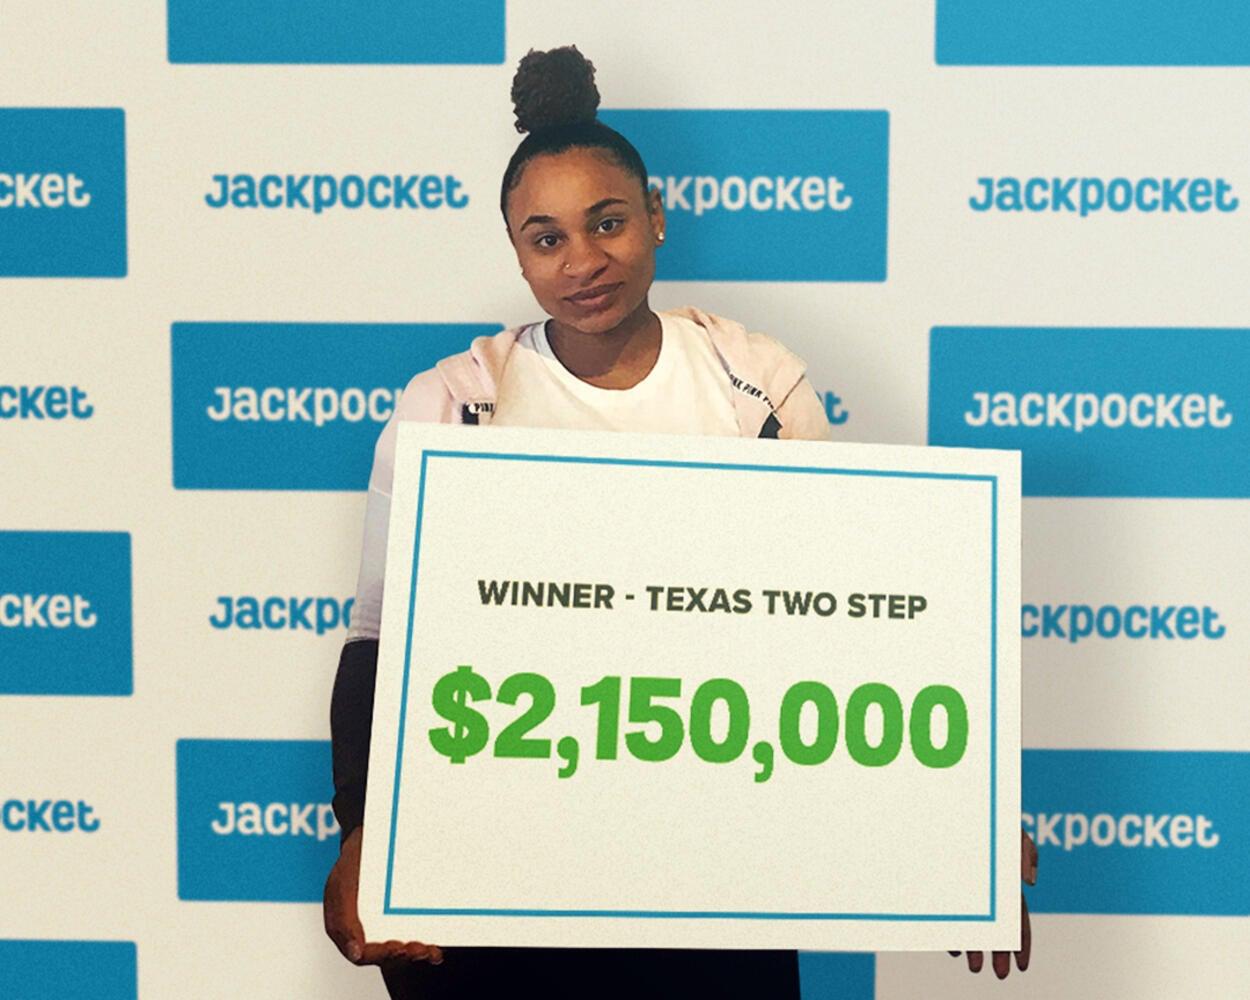 $2M Two Step lottery jackpot winner on Jackpocket